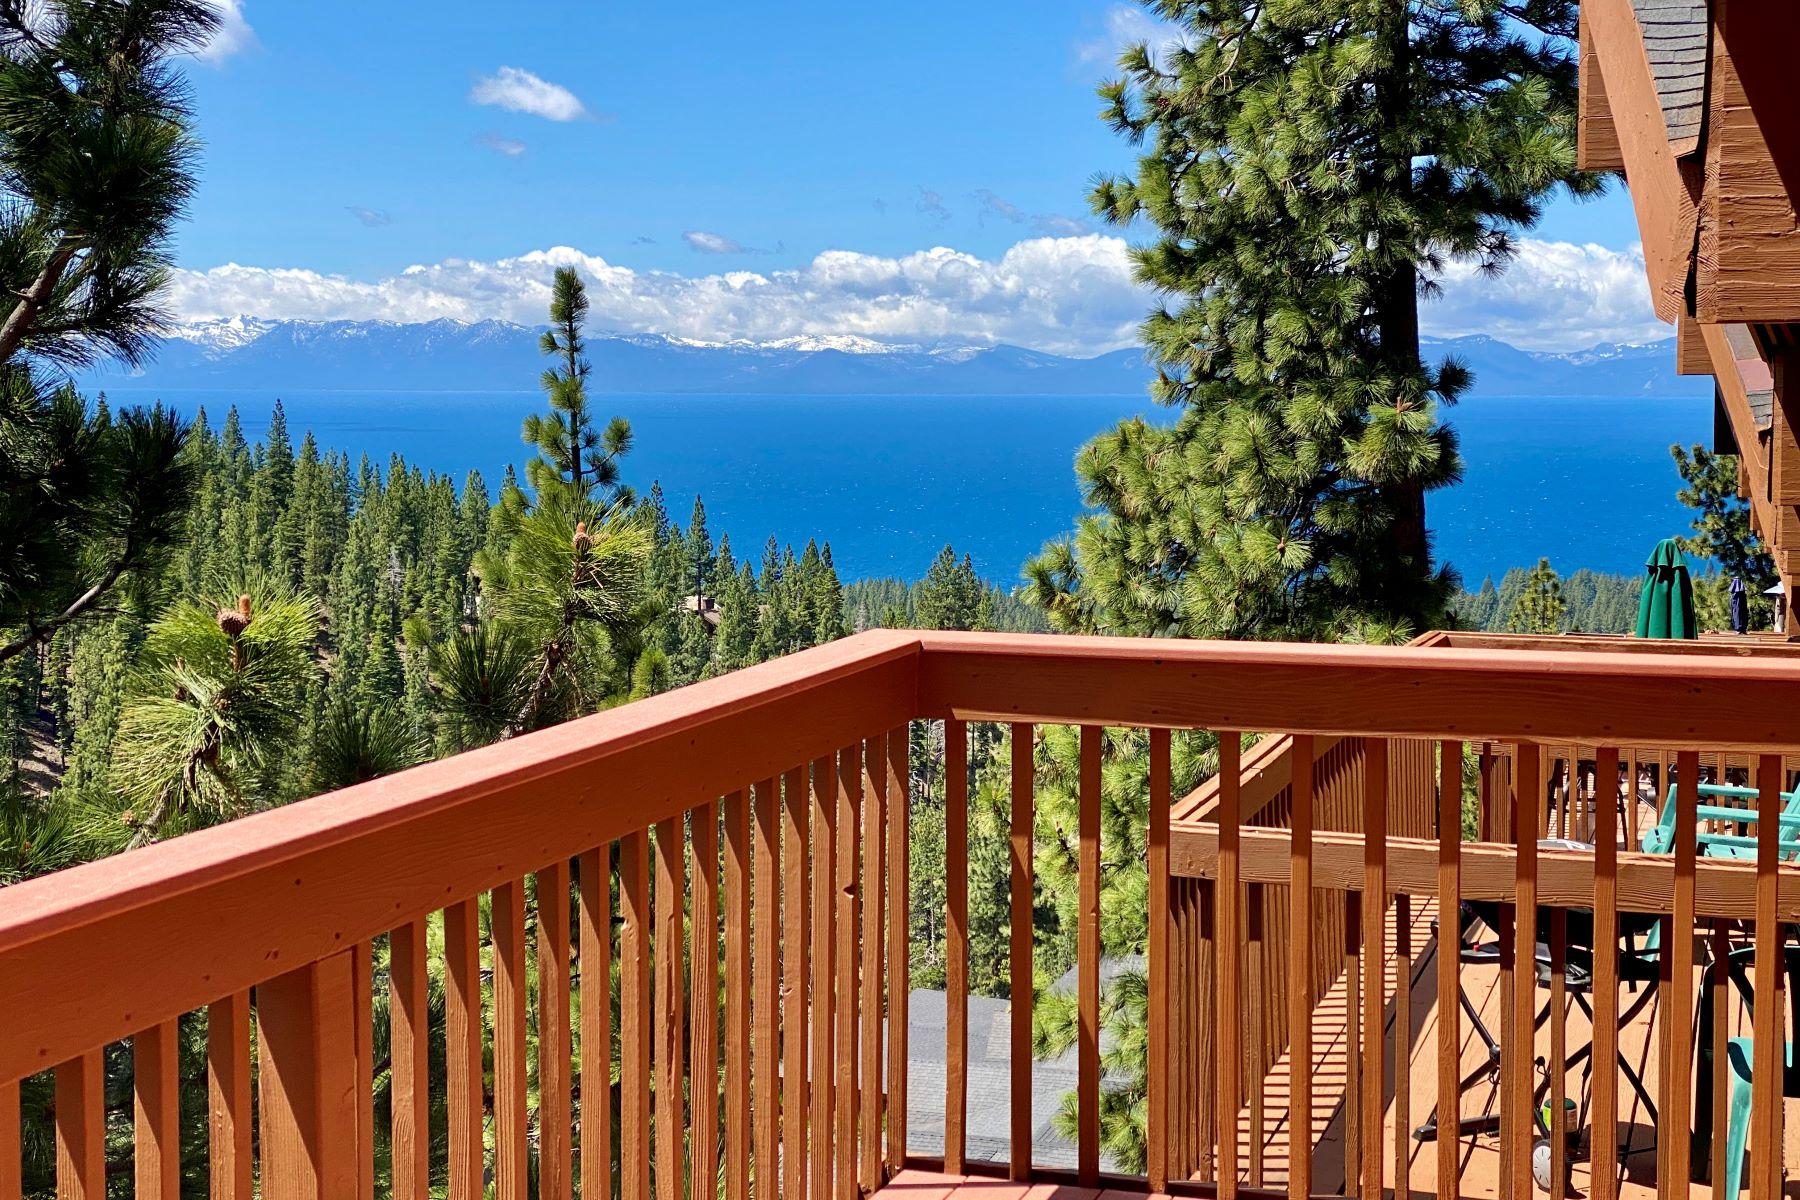 Lake & Ski View End Unit Condo 400 Fairview Blvd. #94 Incline Village, Nevada 89451 Estados Unidos